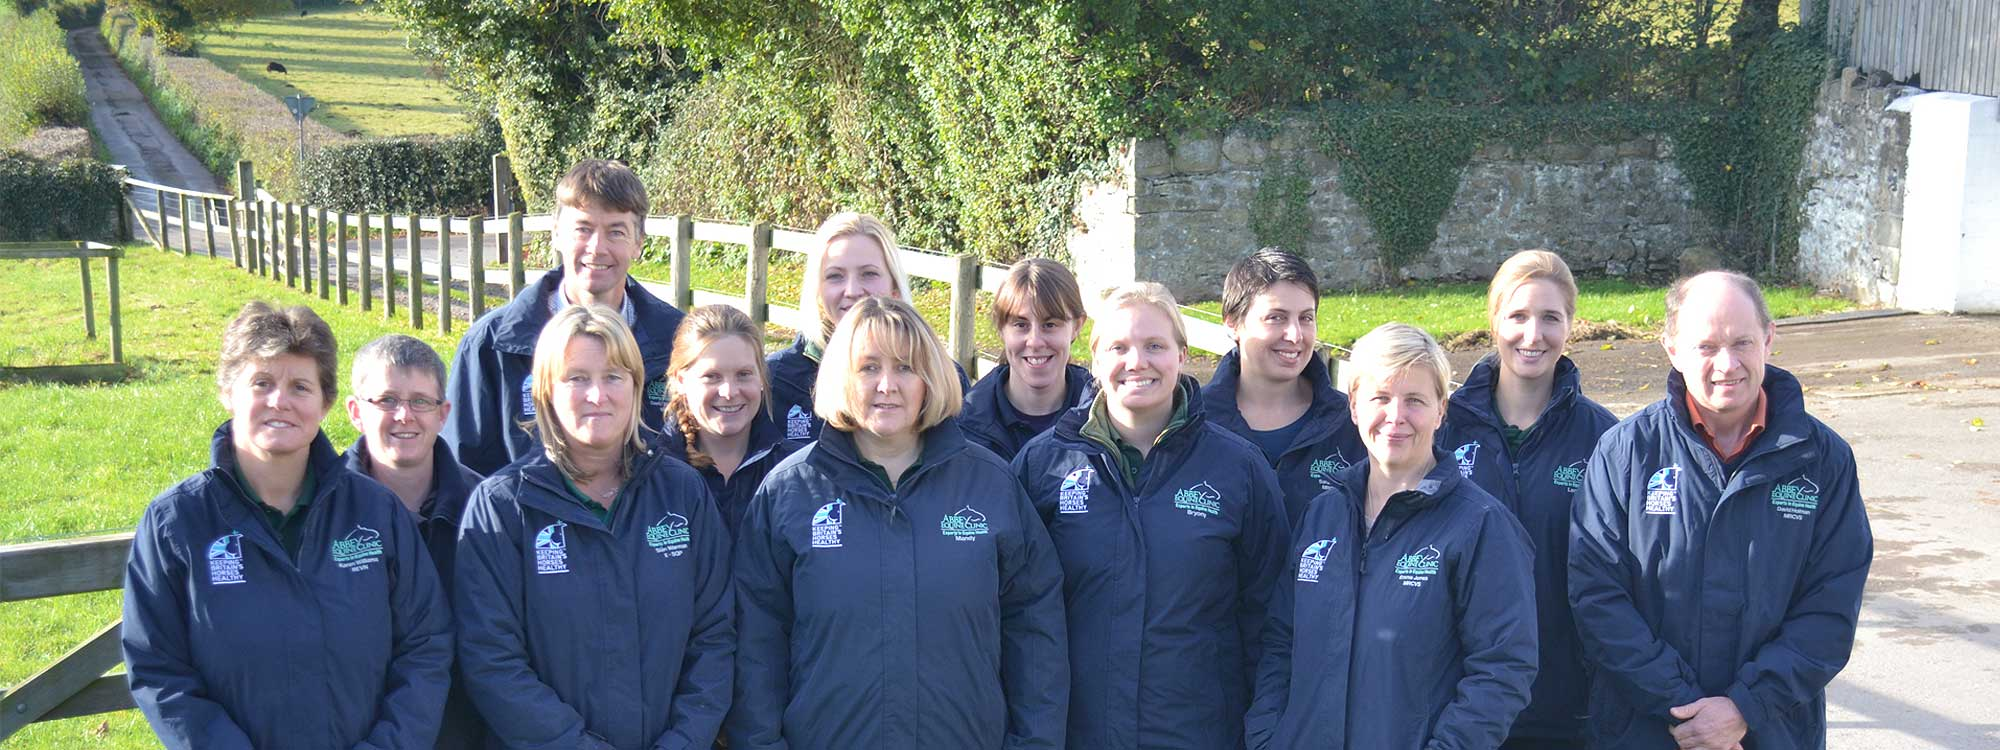 Abbey Equine Centre Meet Your Team